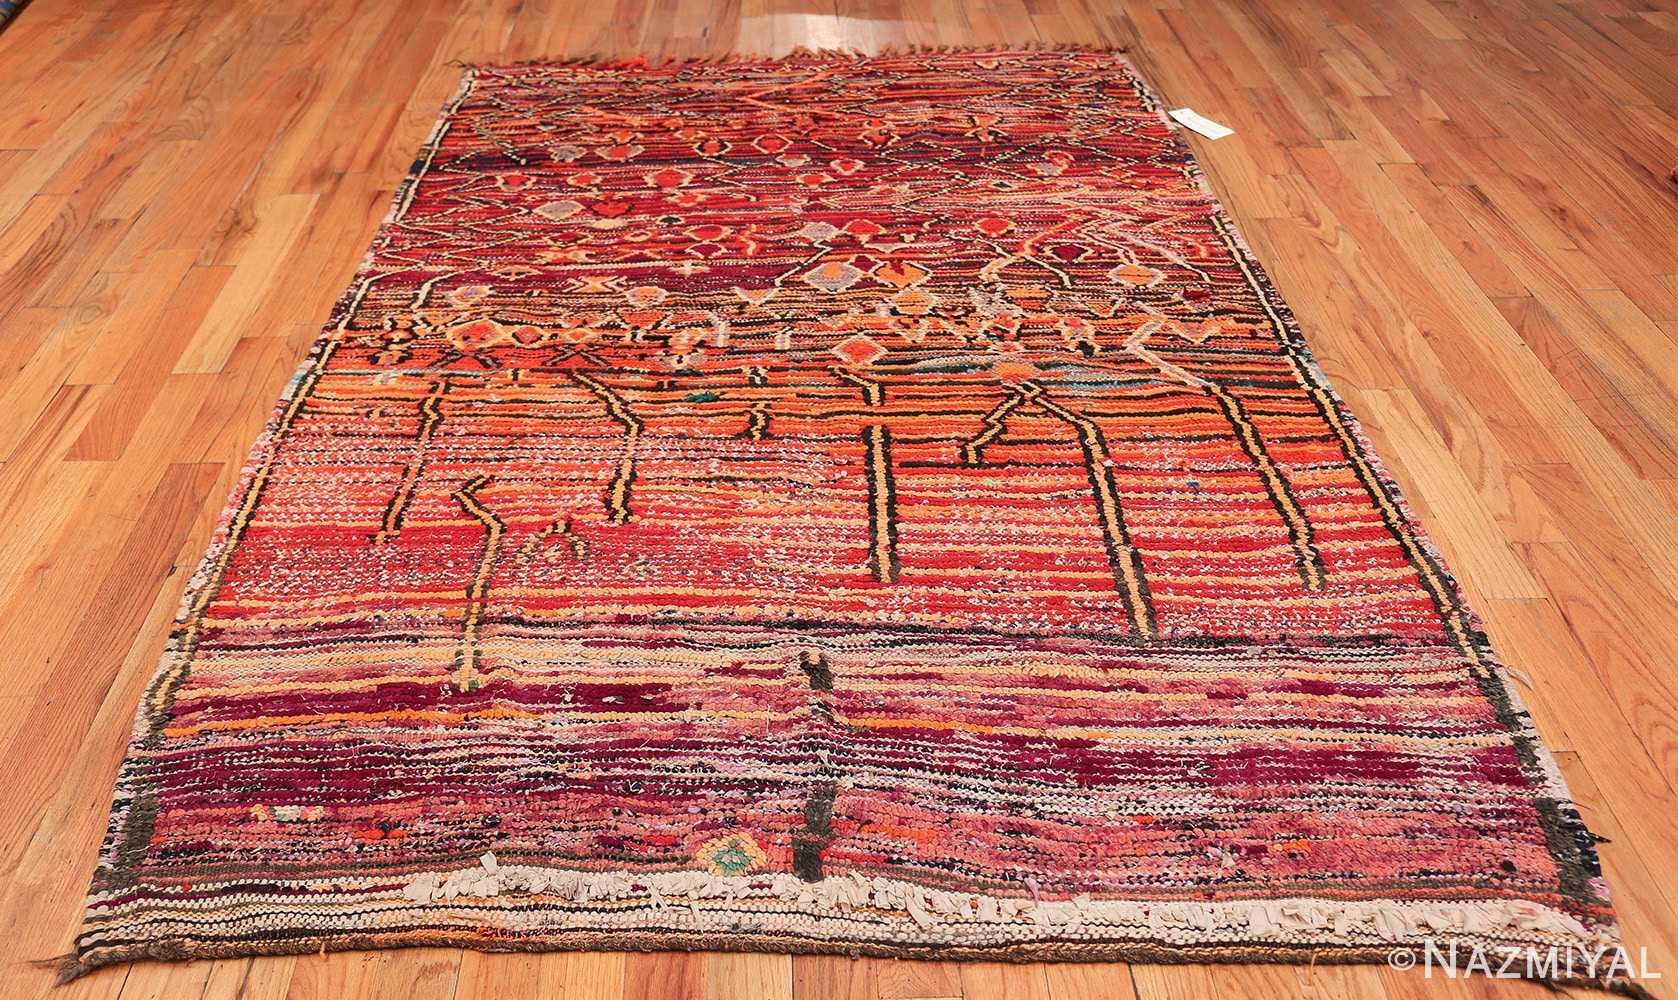 Colorful Vintage Moroccan Rug 49859 Whole Design Nazmiyal